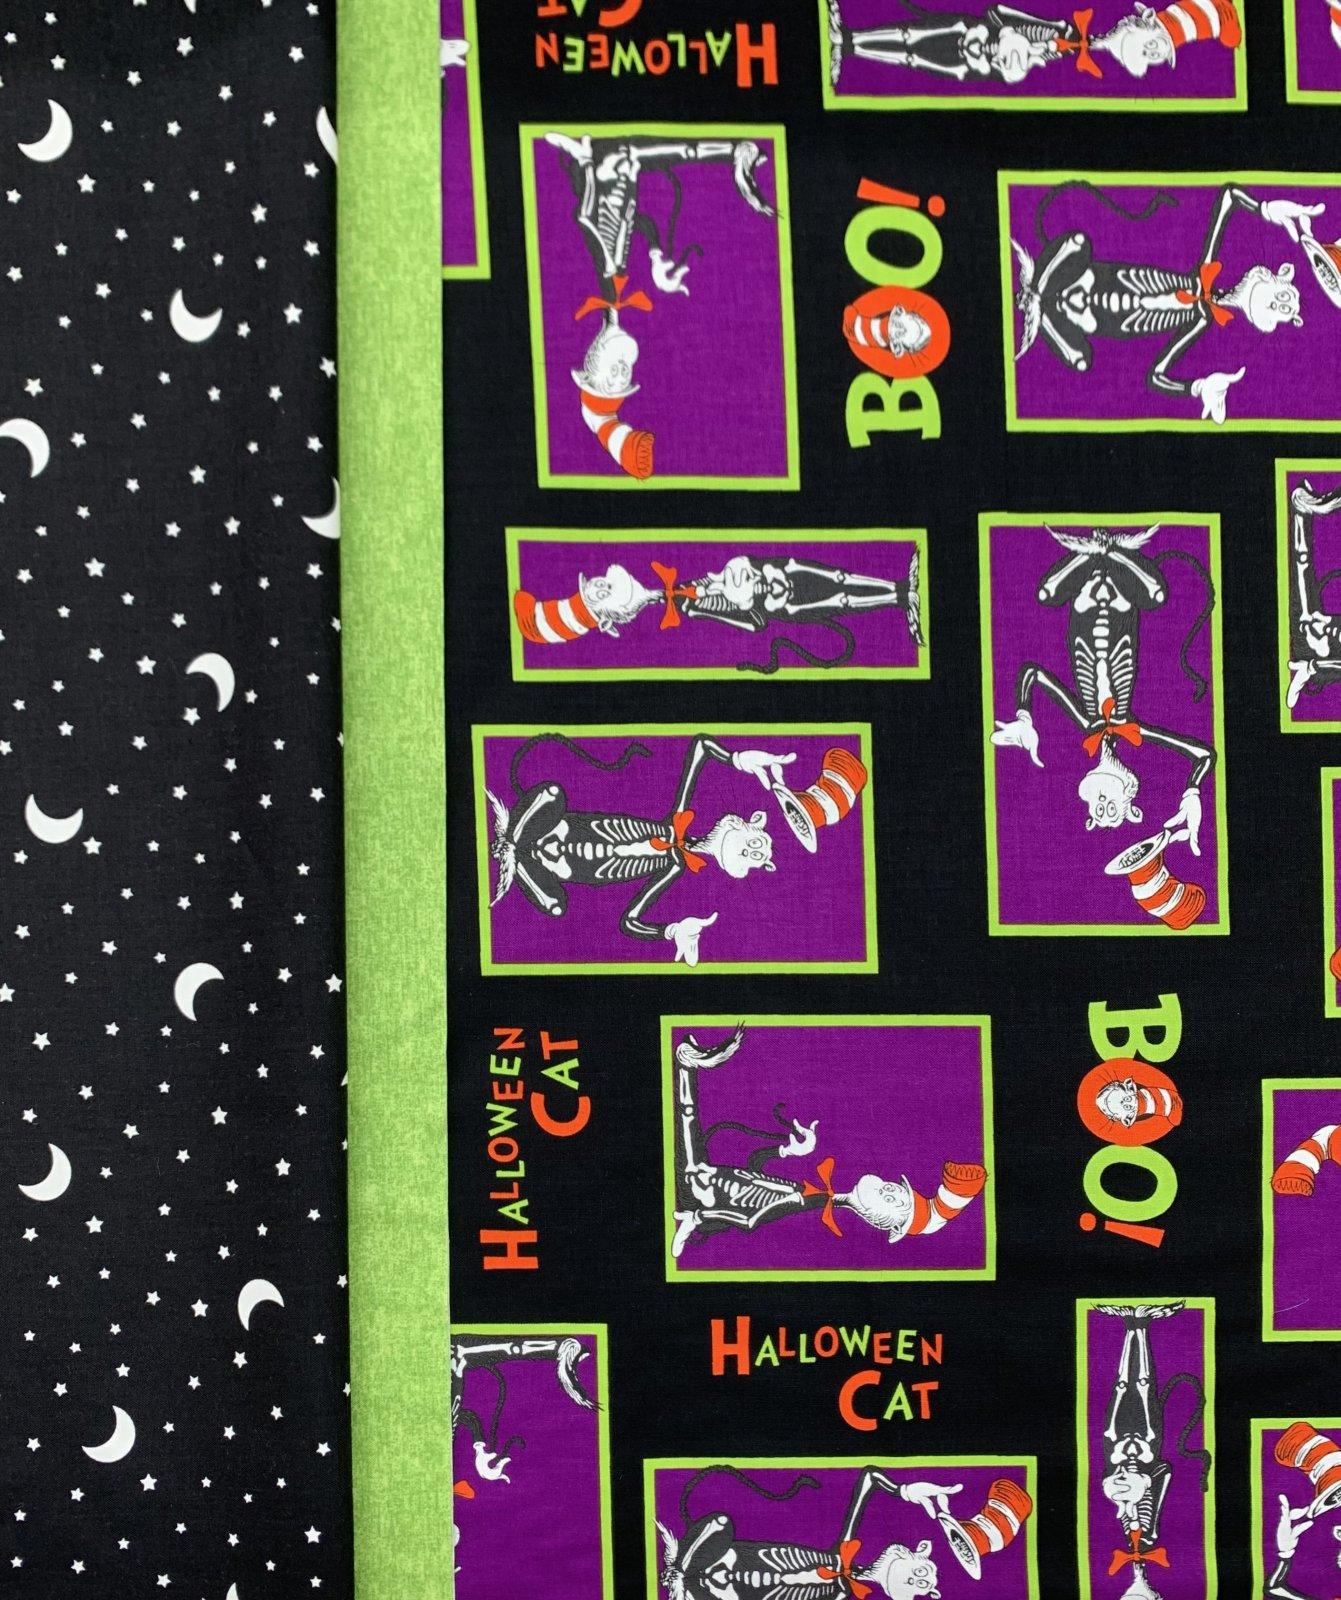 Dr. Seuss Halloween Cat Pillowcase Kit